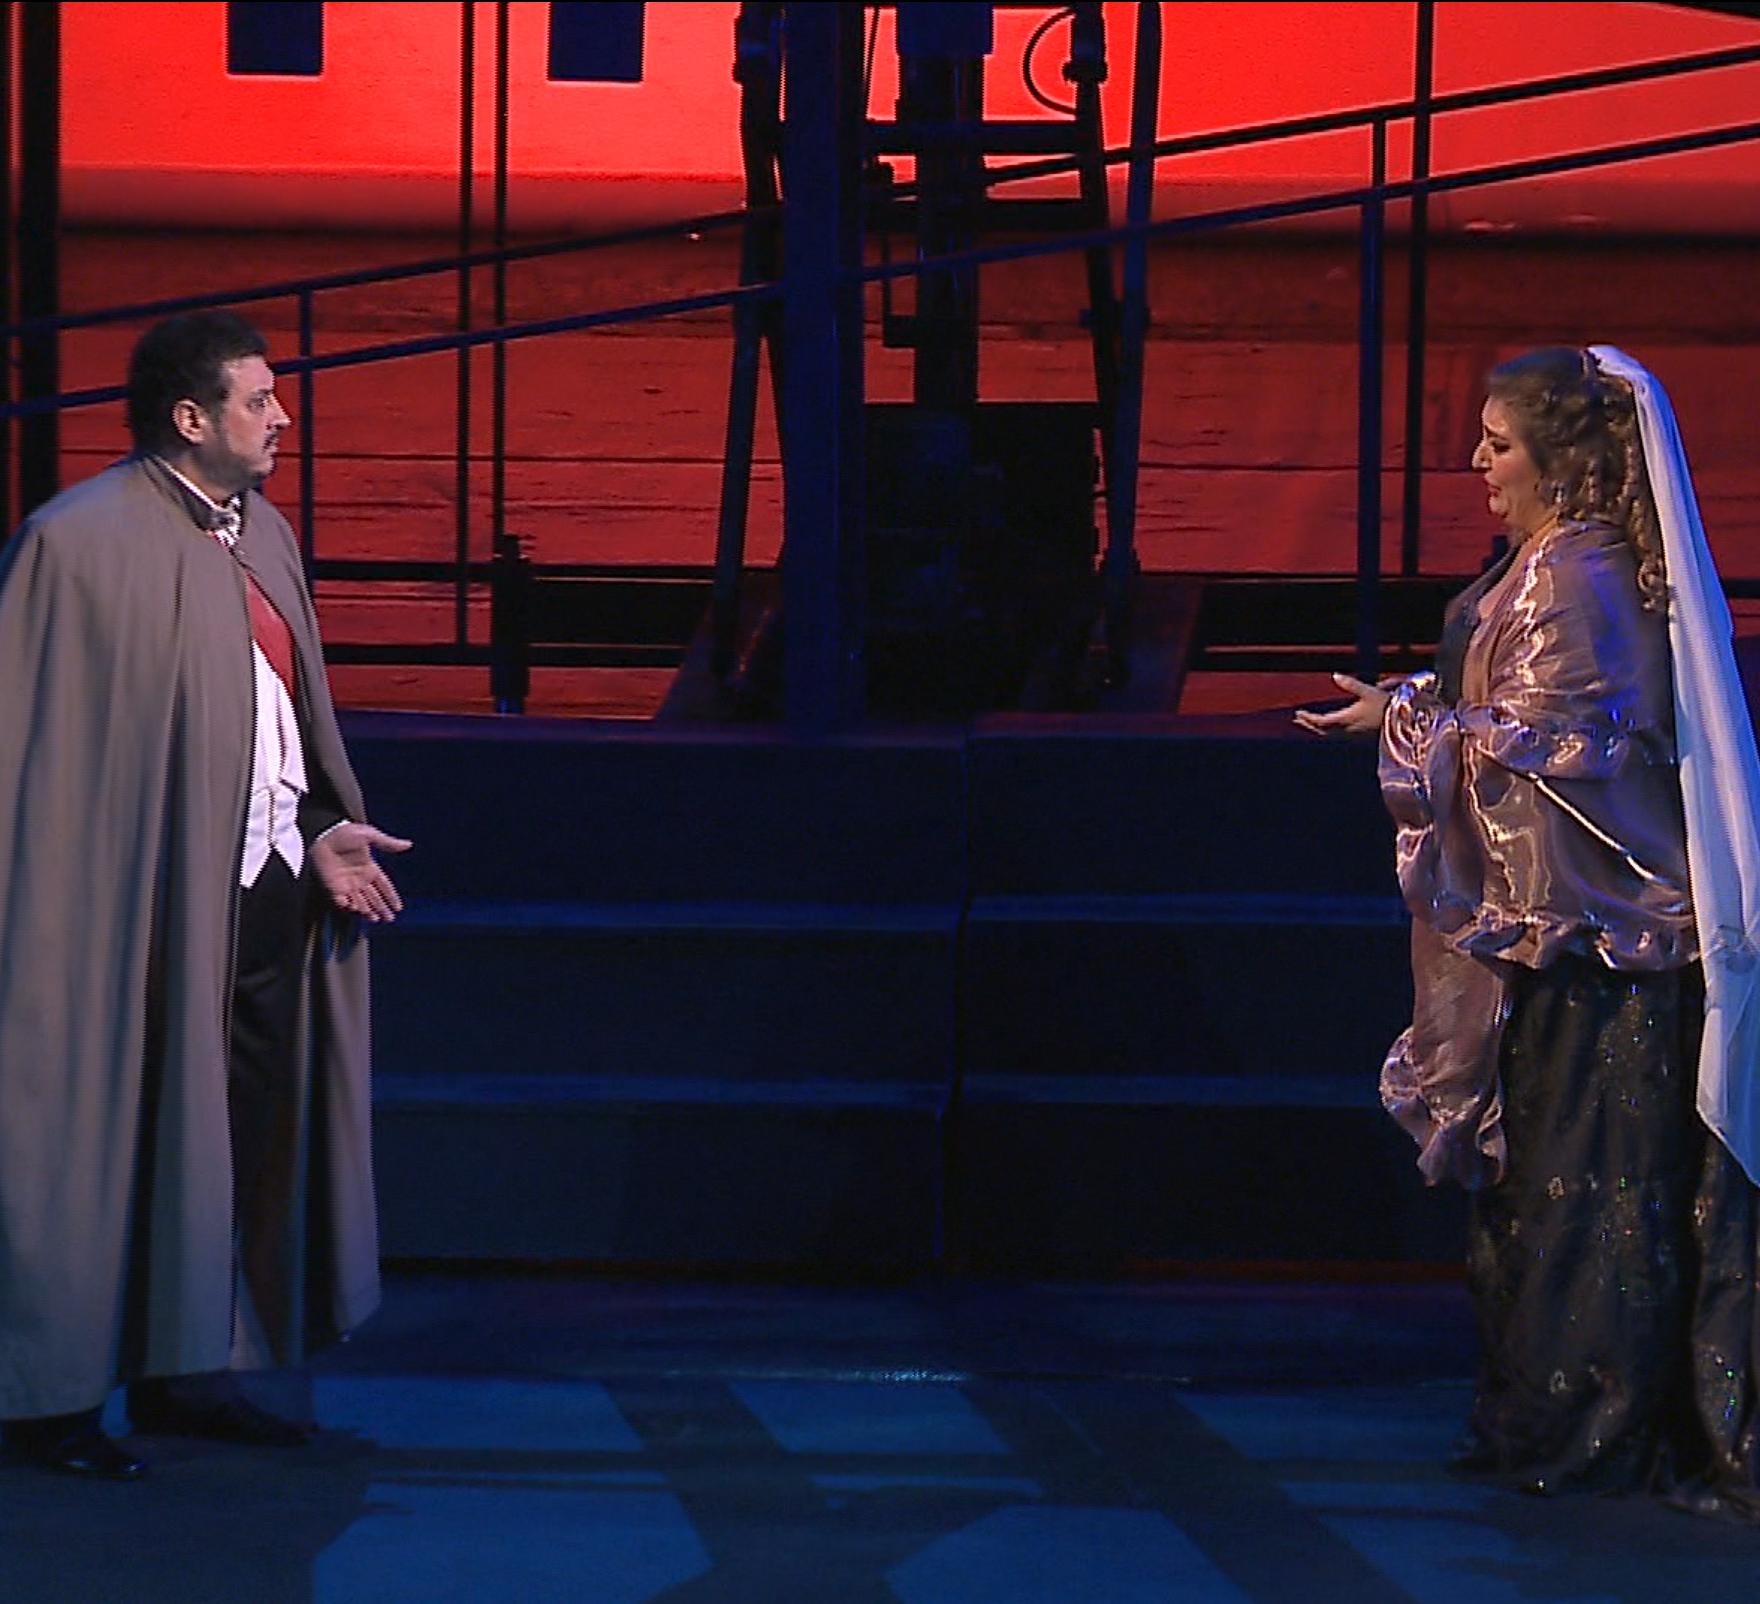 Un ballo in maschera, Act two, Duet of Amelia and Riccardo - SOF - 2017